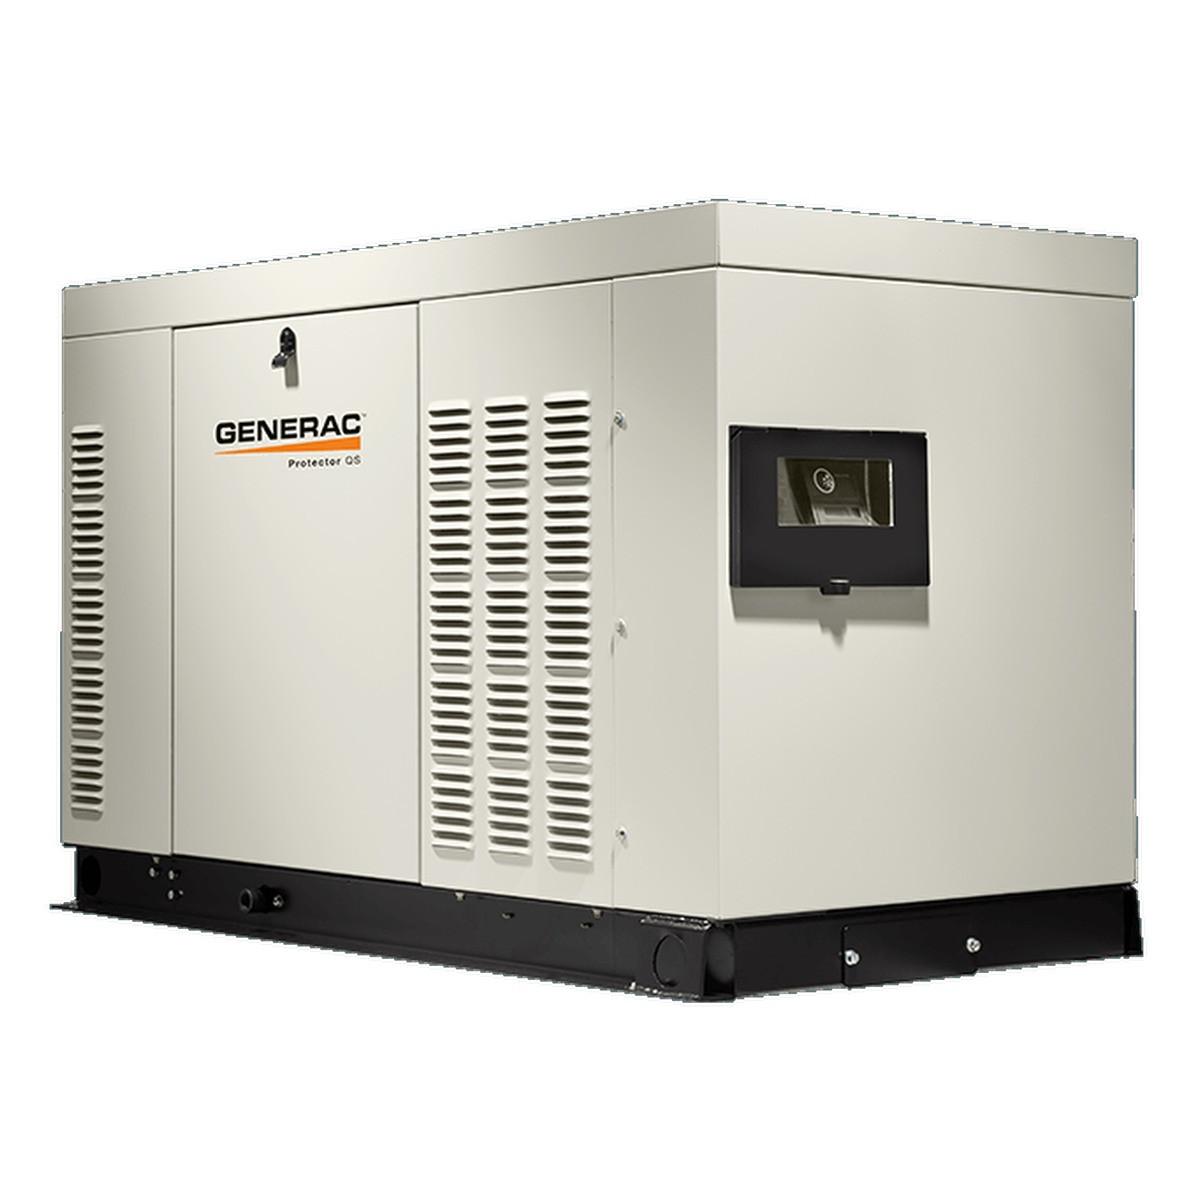 medium resolution of generac protector series rg03015 30kw generator rh apelectric com generac transfer switch wiring diagram generac transfer switch wiring diagram